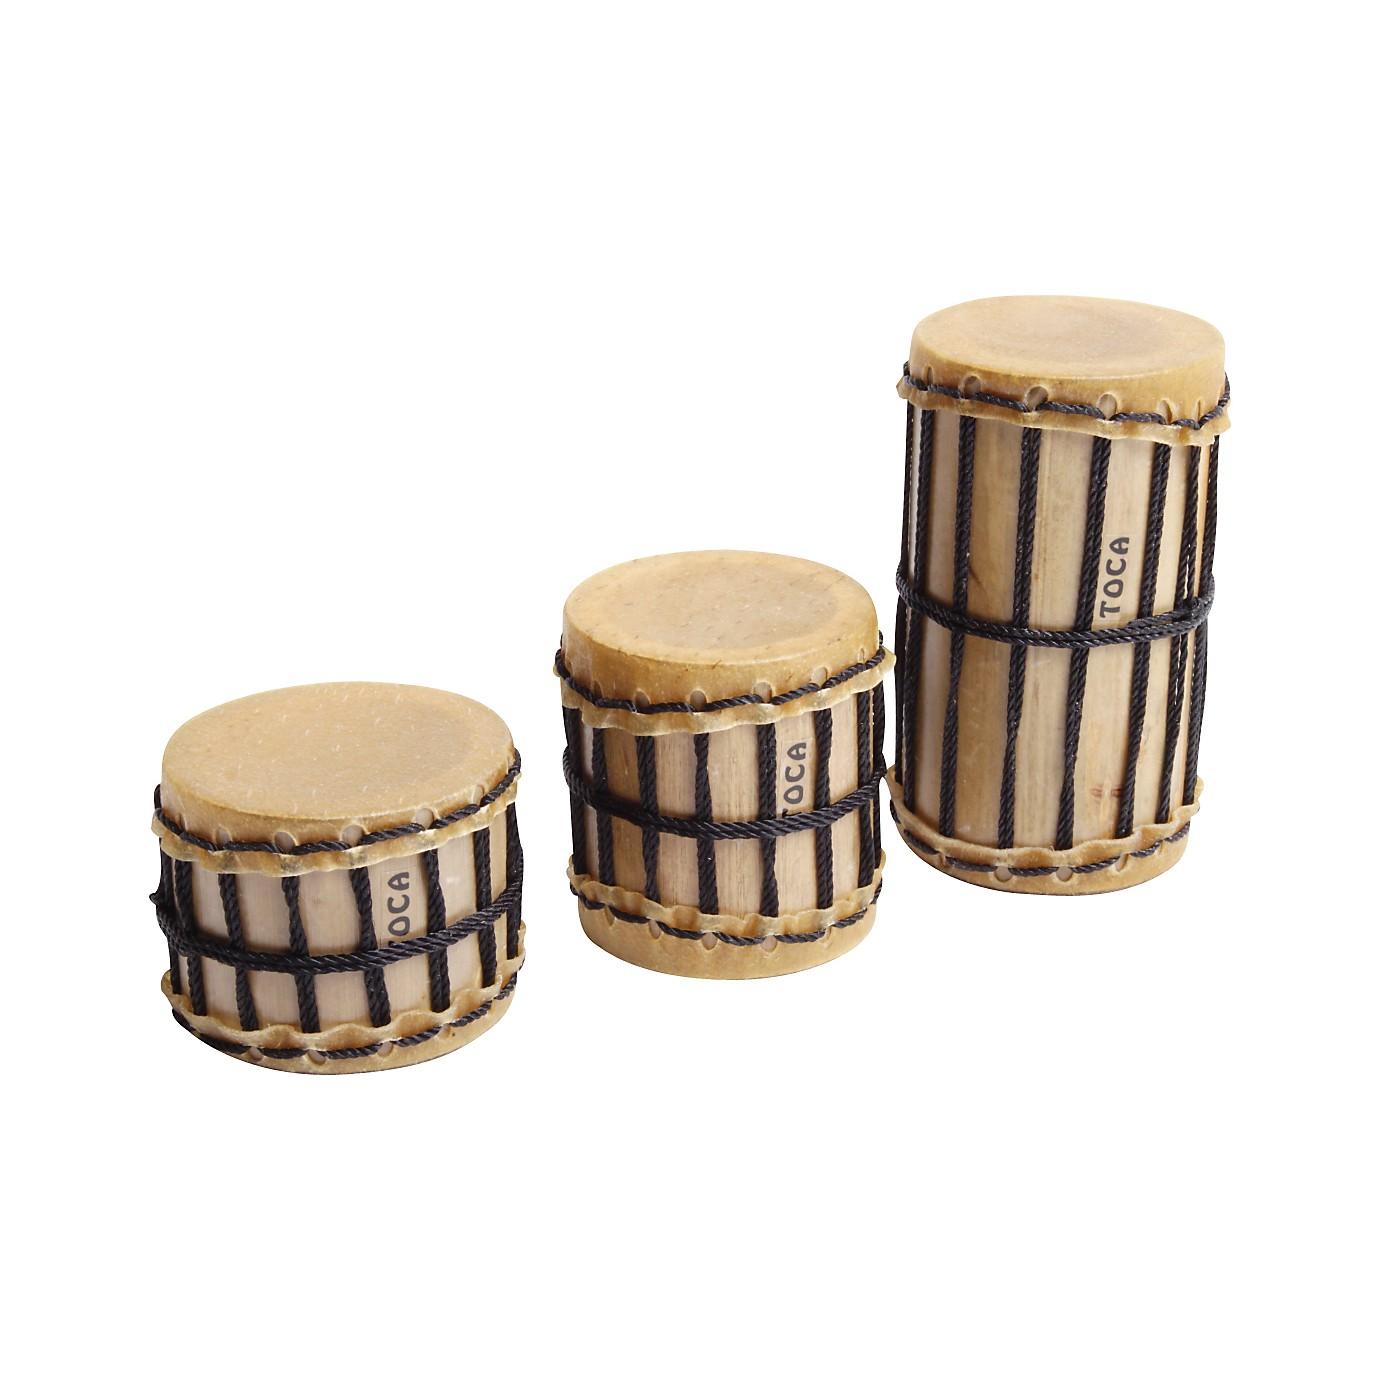 Toca Bamboo Shakers Set of 3 thumbnail